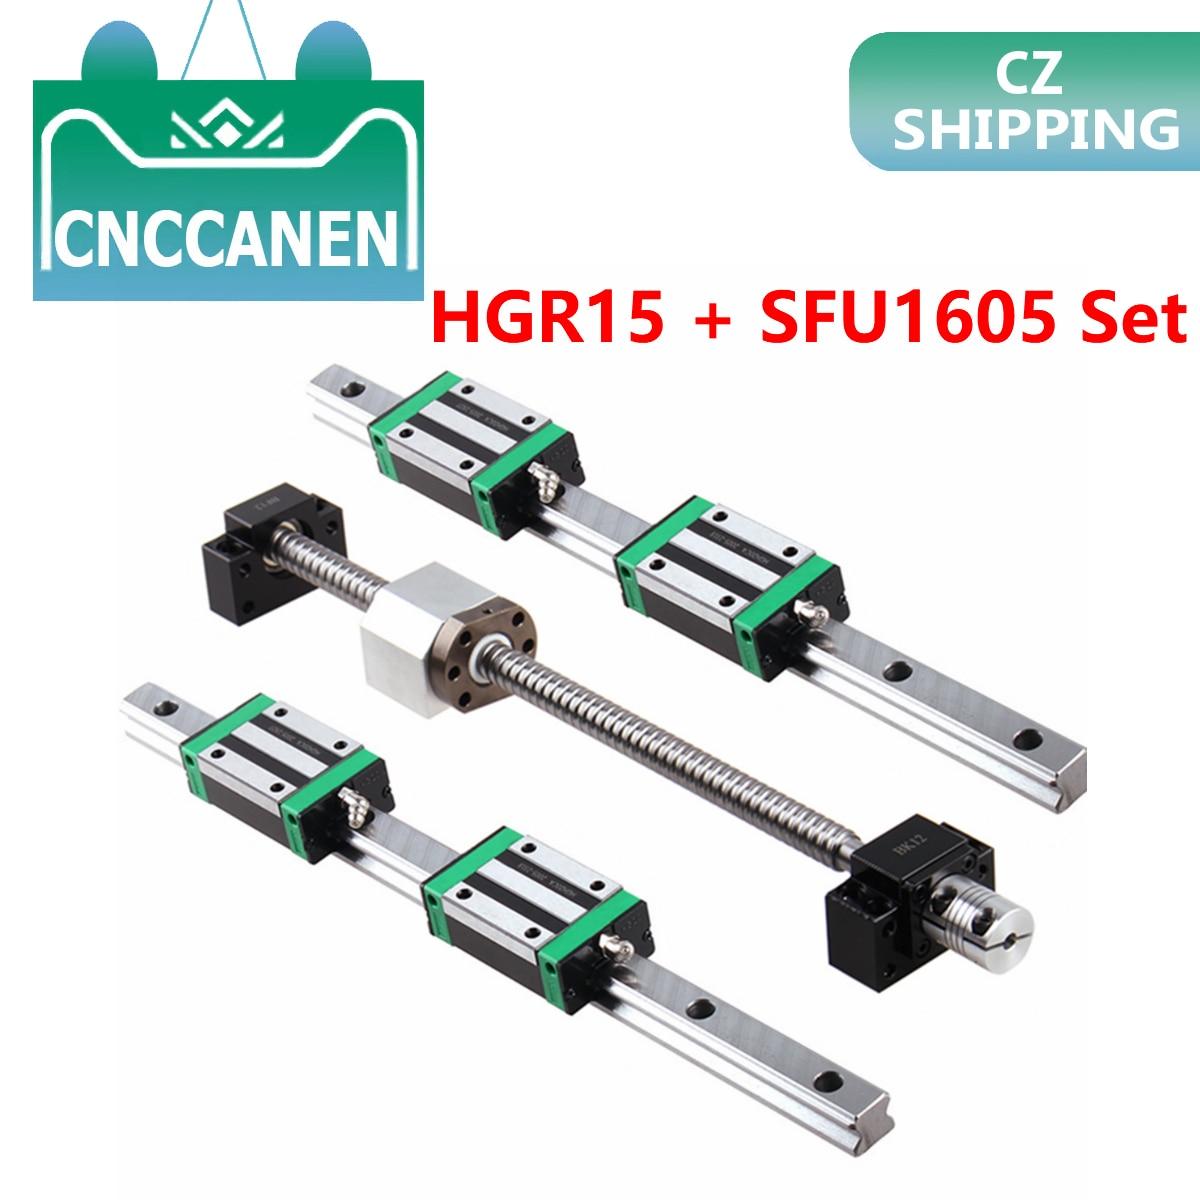 HGR15 مربع الخطي دليل السكك الحديدية 2 مجموعة HGR15 + كتلة HGH15CA + SFU1605 الكرة المسمار 5 مللي متر الرصاص + BK12BF12 CNC خطي المحرك تشيكوسلوفاكيا الأسهم